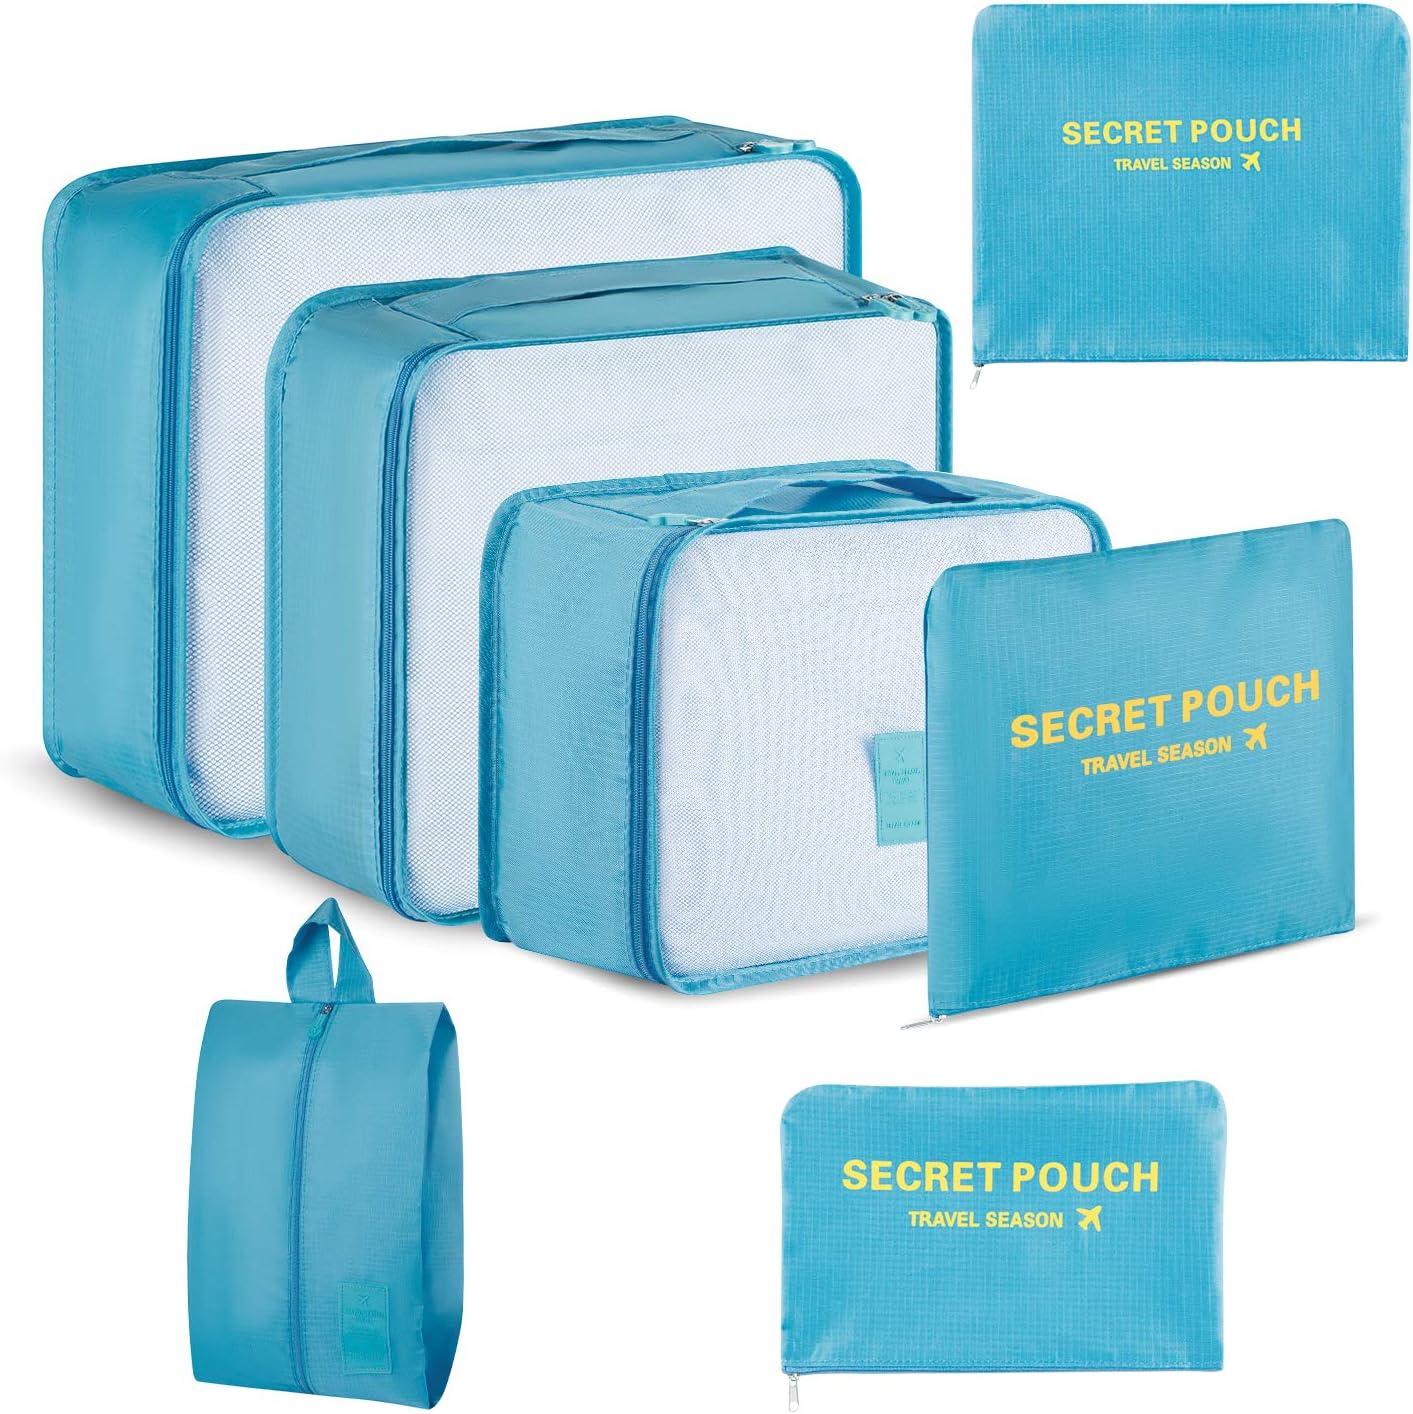 Newdora 7 en 1 Set de Organizador de Equipaje Viaje con Bolsa de Zapato,Impermeable Organizador de Maleta Bolsa para Ropa Sucia de Viaje, Portatrajes de Viaje, Material Nylon, Azul